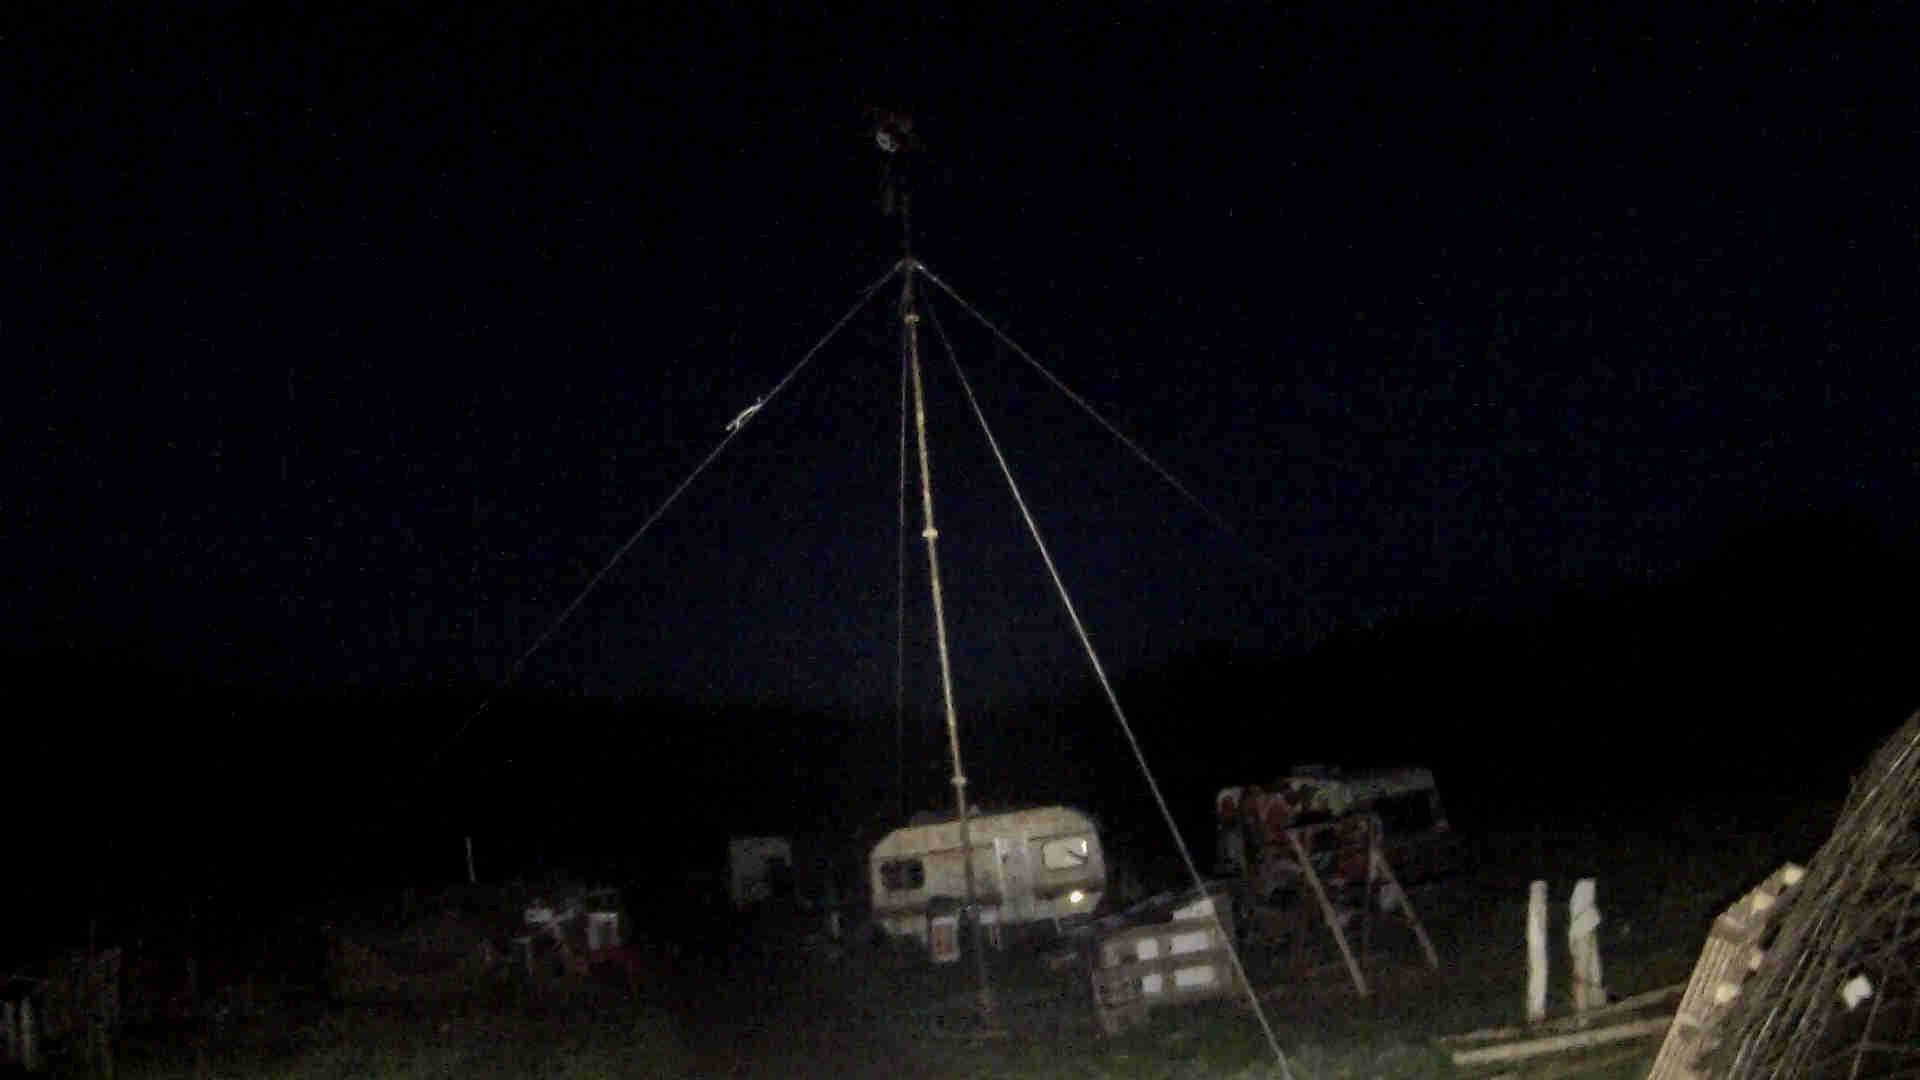 Turbina de viento en la pradera por la noche